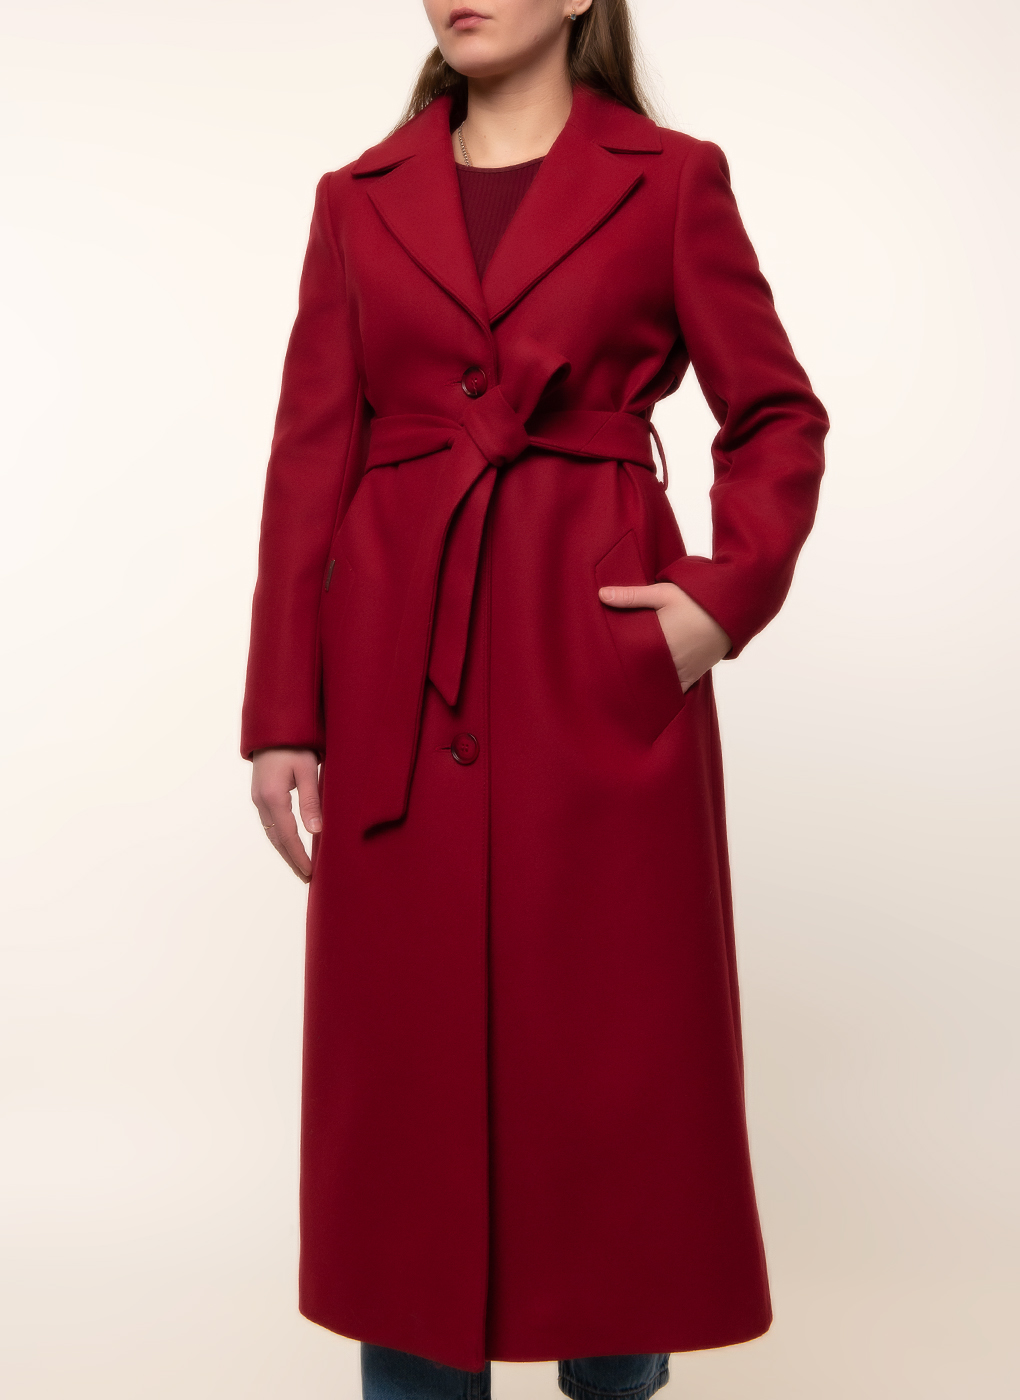 Пальто шерстяное 106, idekka фото